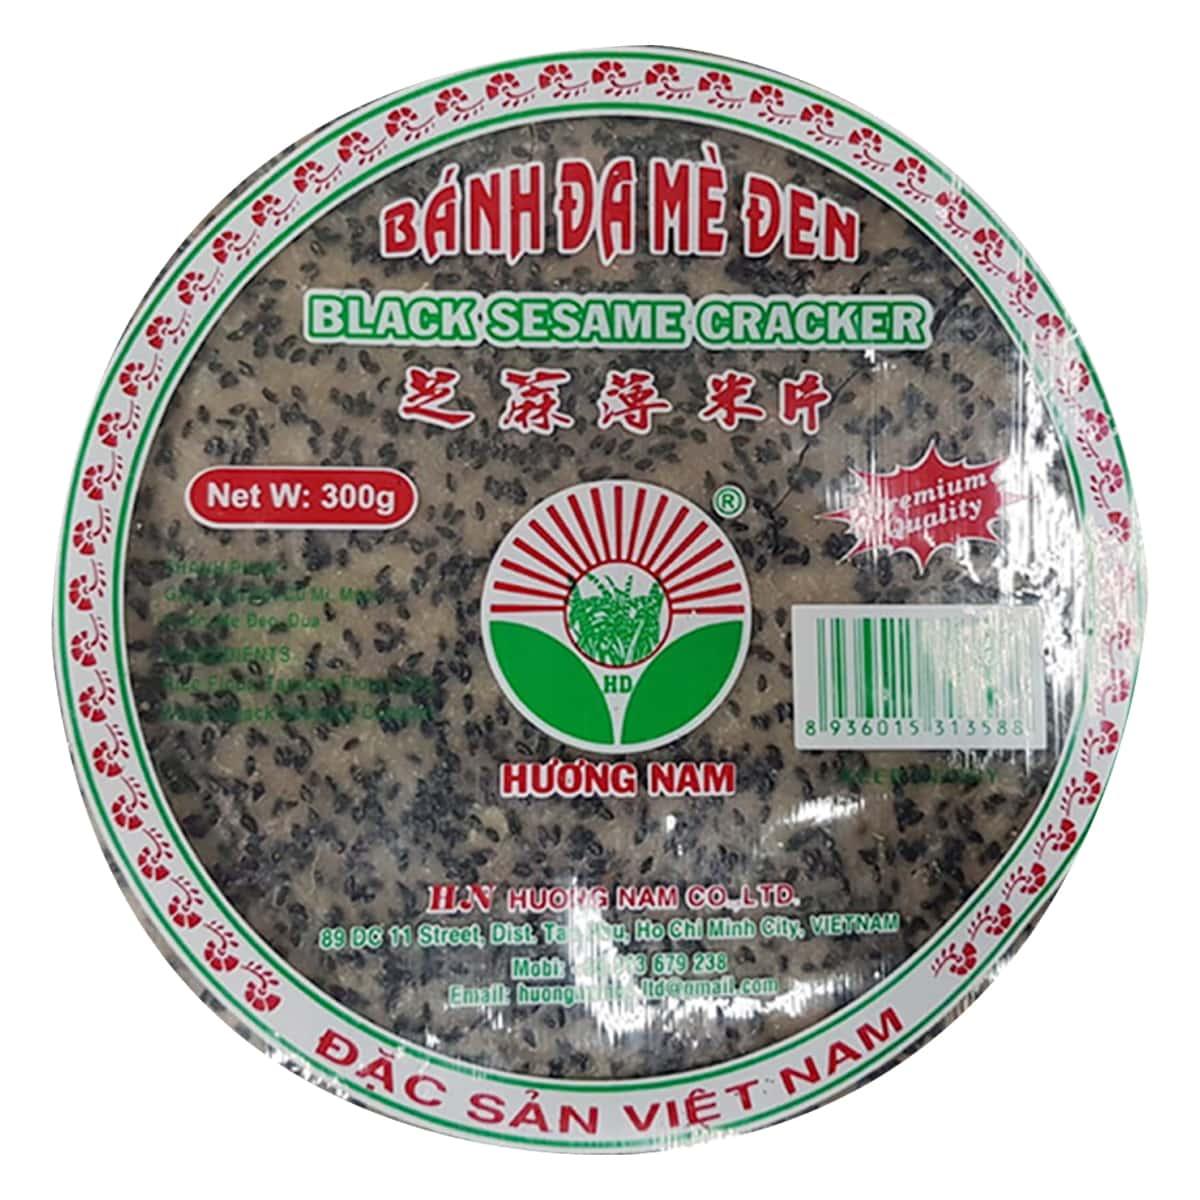 Buy Houng Nam Black Sesame Crackers - 300 gm